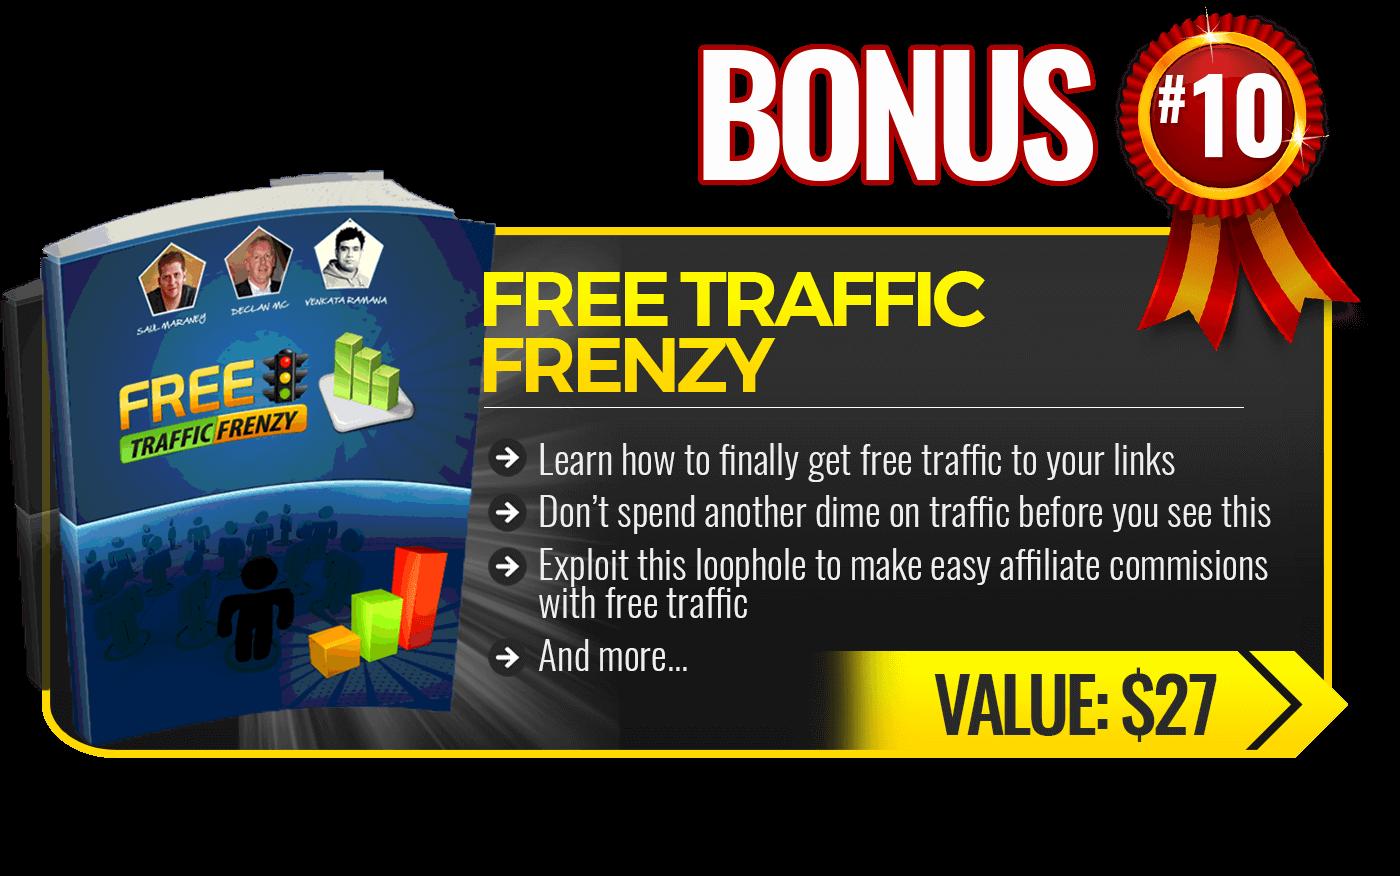 10. Free Traffic